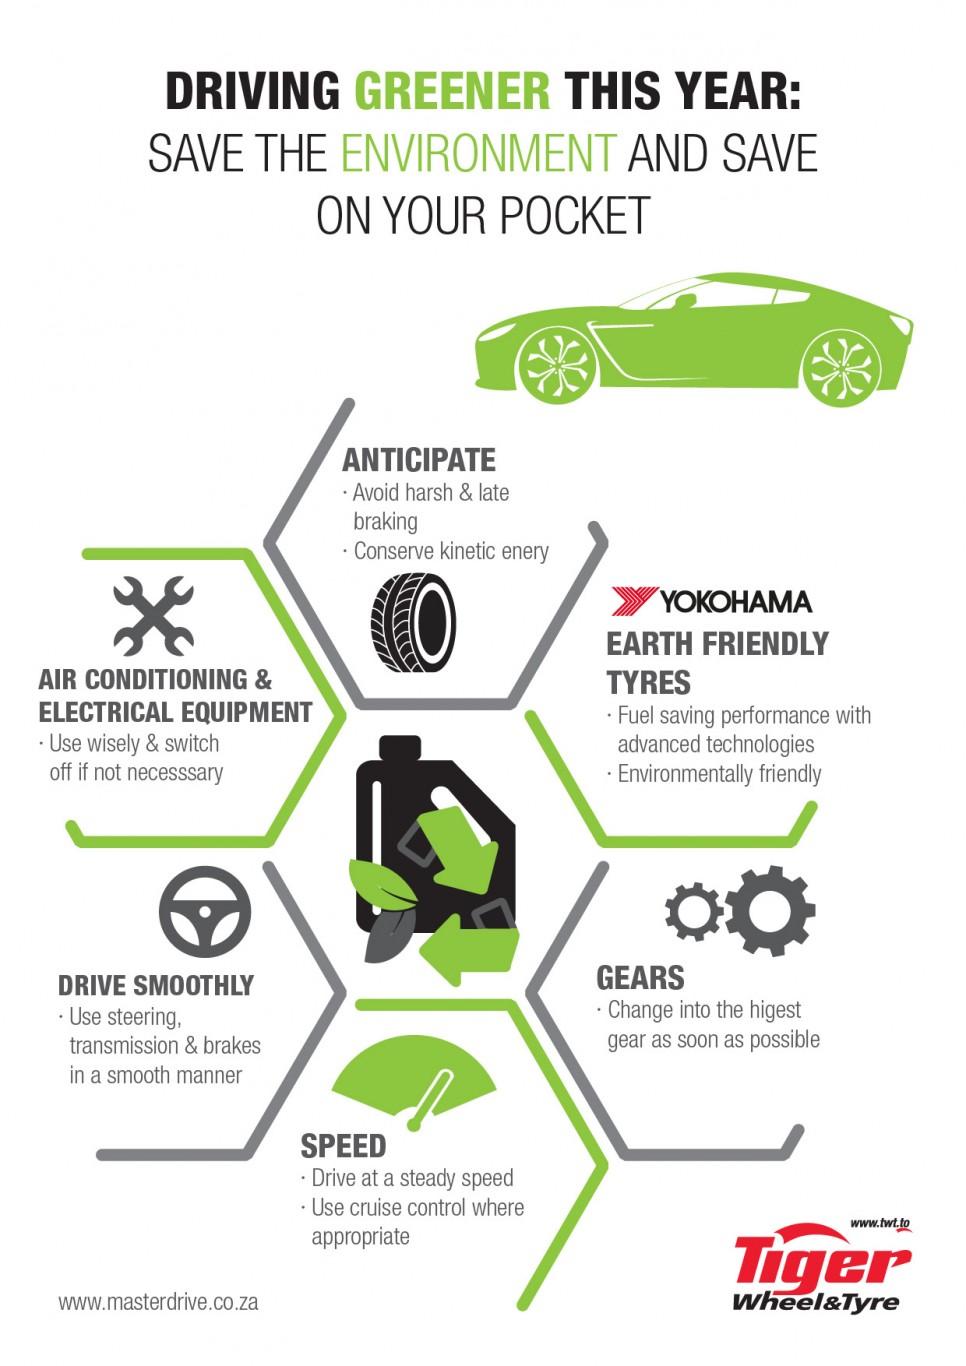 twt-infographic-pr-driving-greener-01